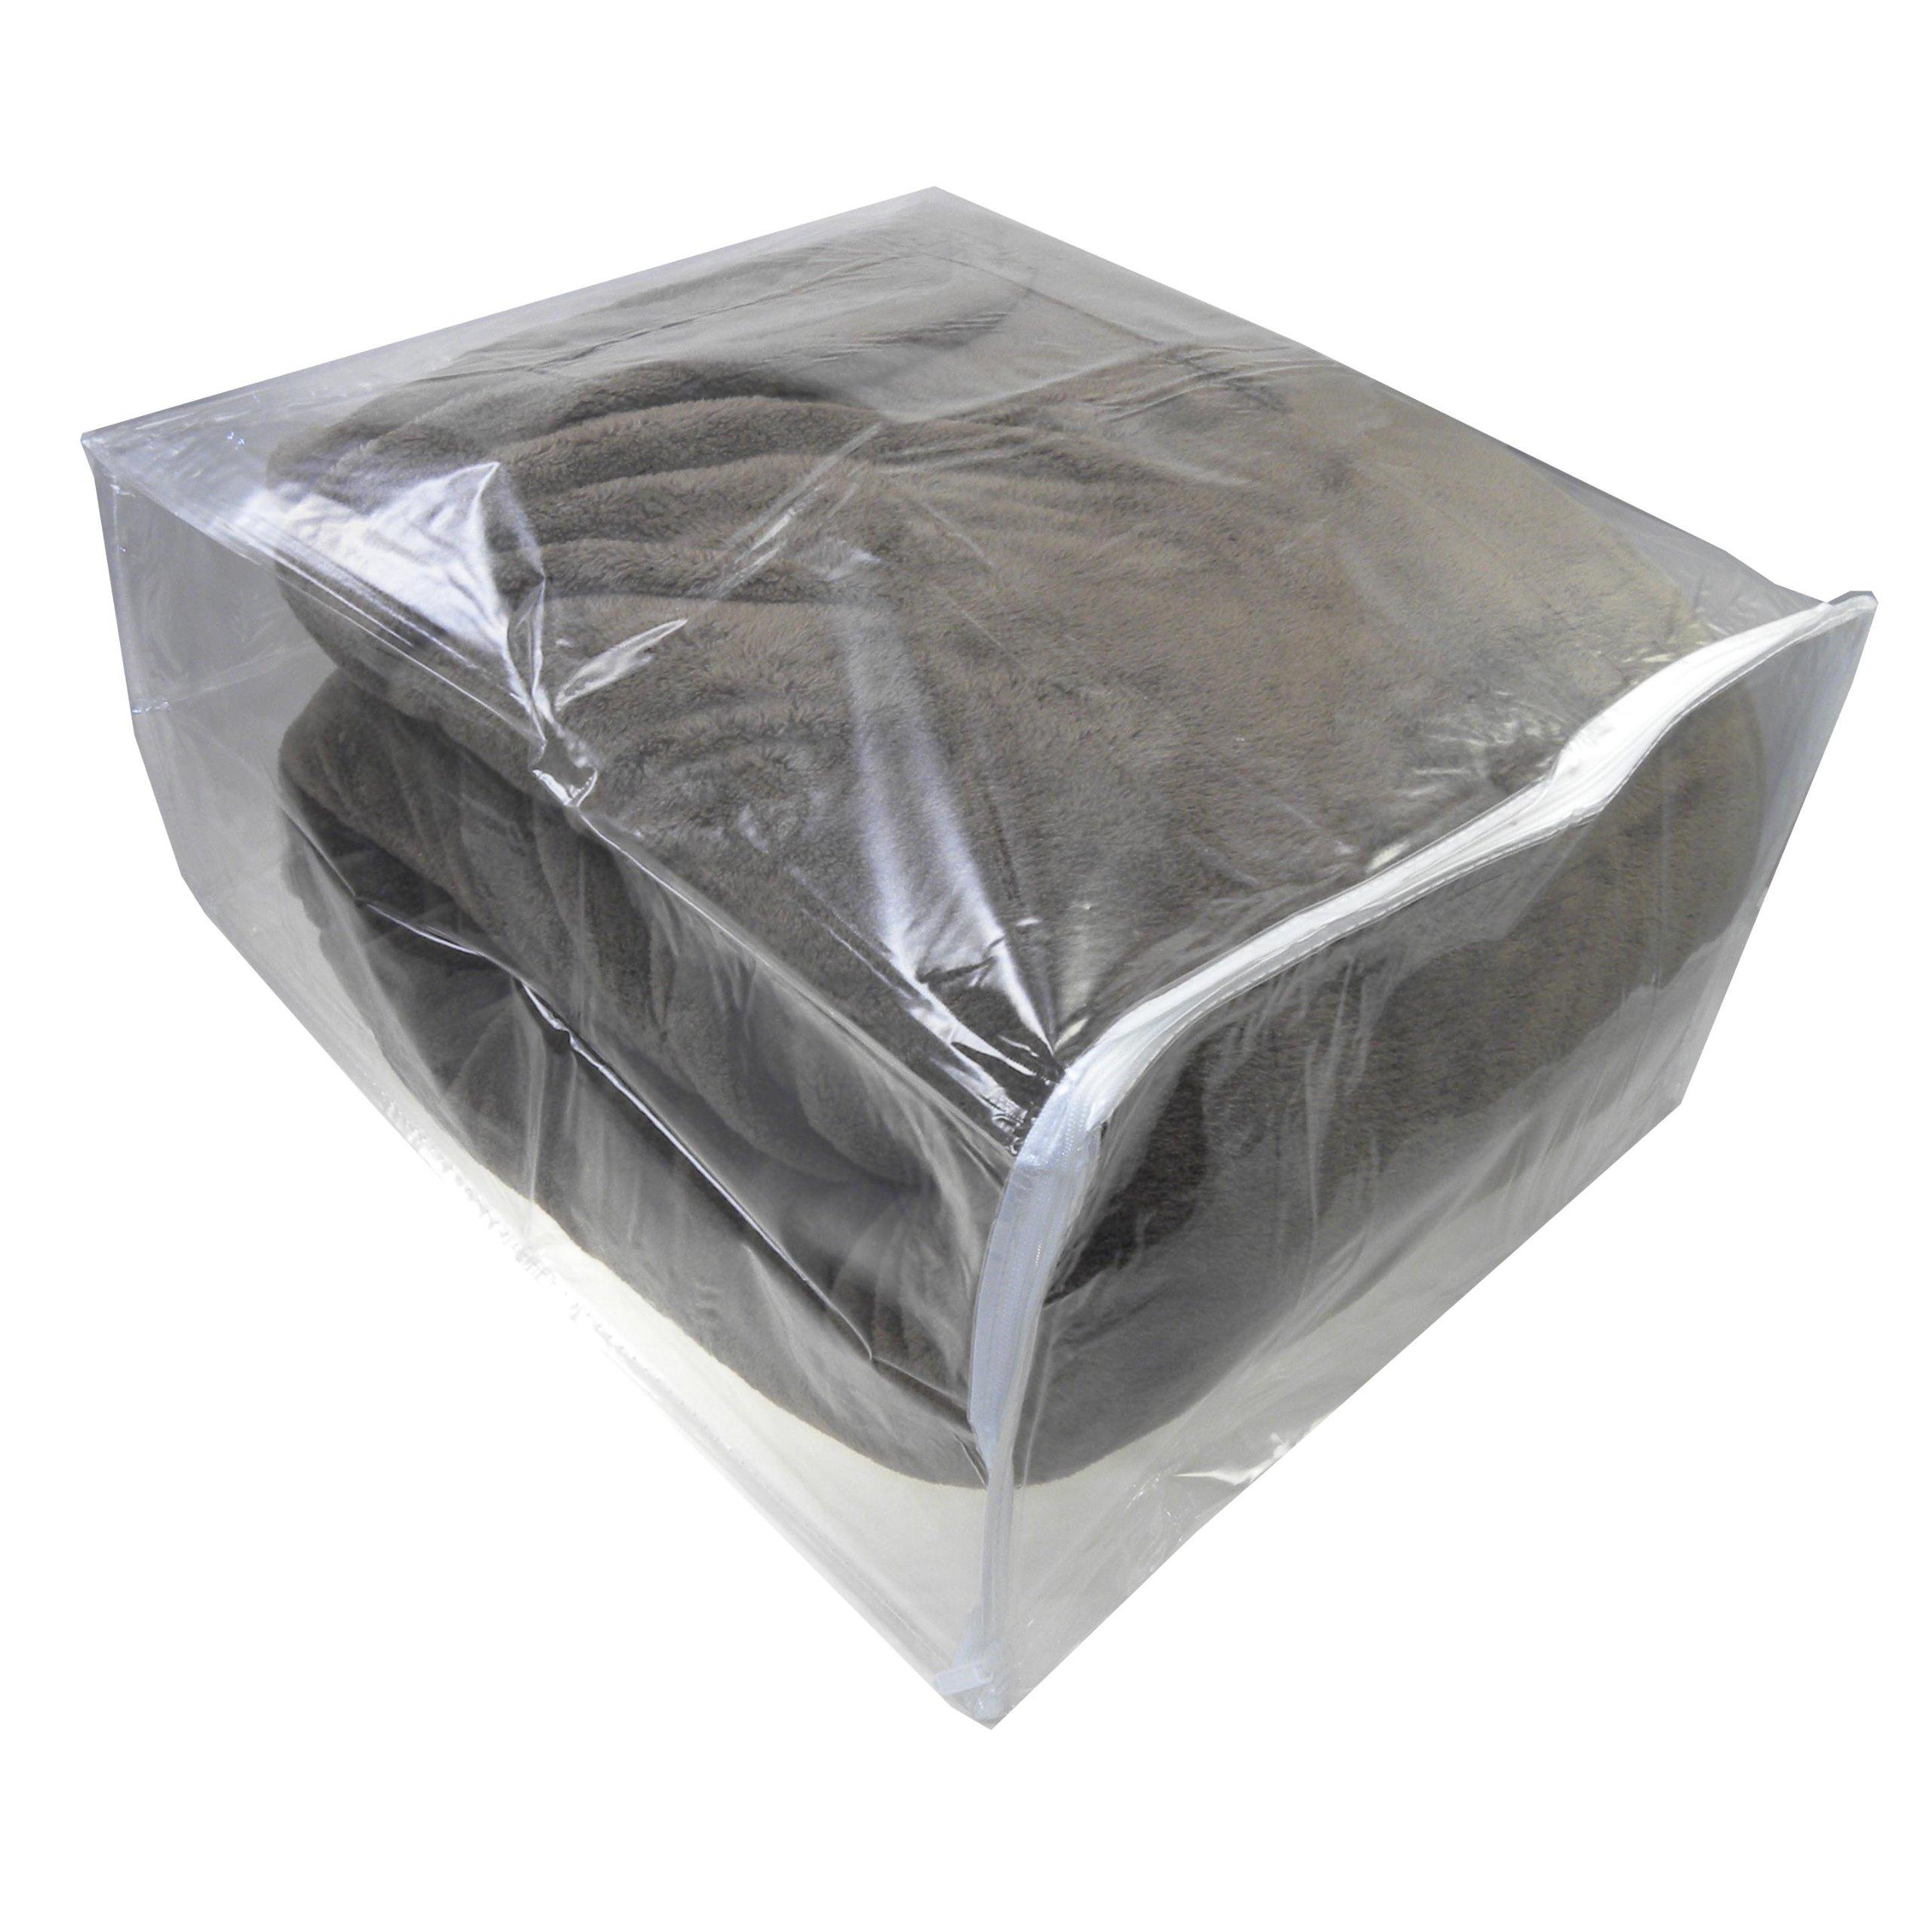 Clear Vinyl Zippered Storage Bags 15x18x9, Set of 10, AK Plastics by AntiqueKitchen by AK Plastics